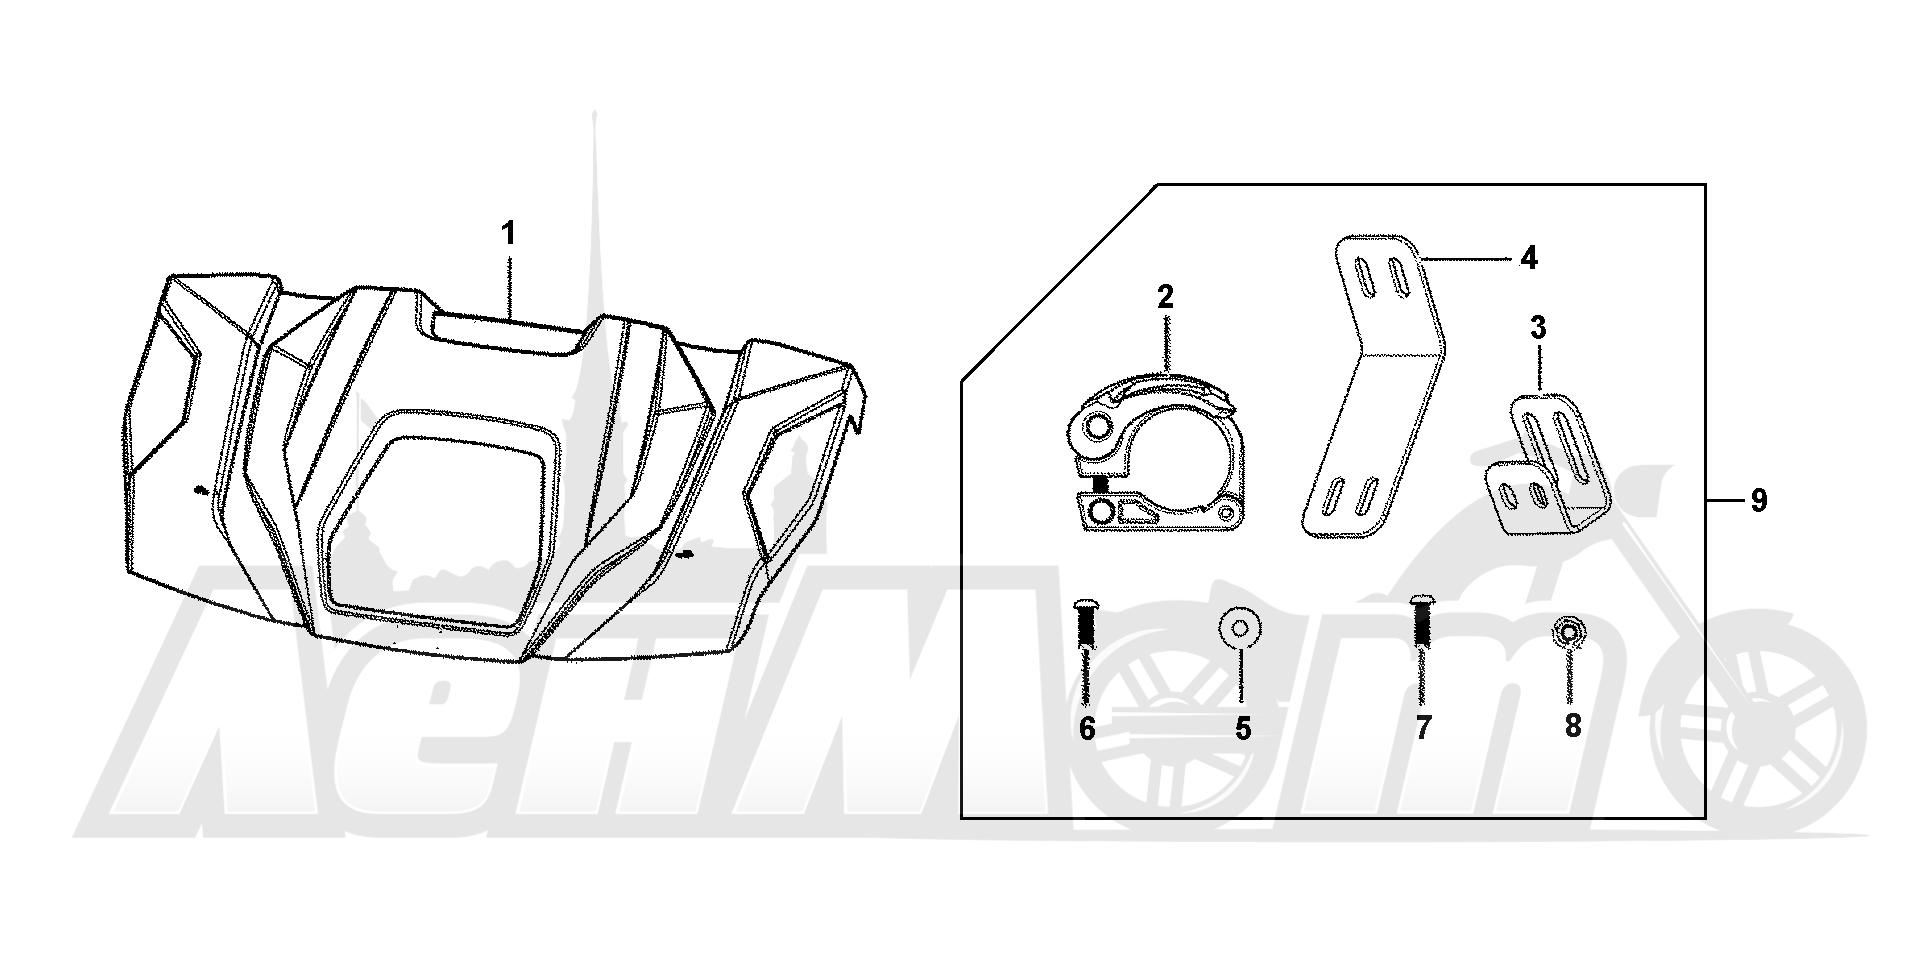 Запчасти для Квадроцикла Honda 2019 SXS1000M5D Раздел: HARD ROOF (3P) | HARD крыша (3P)